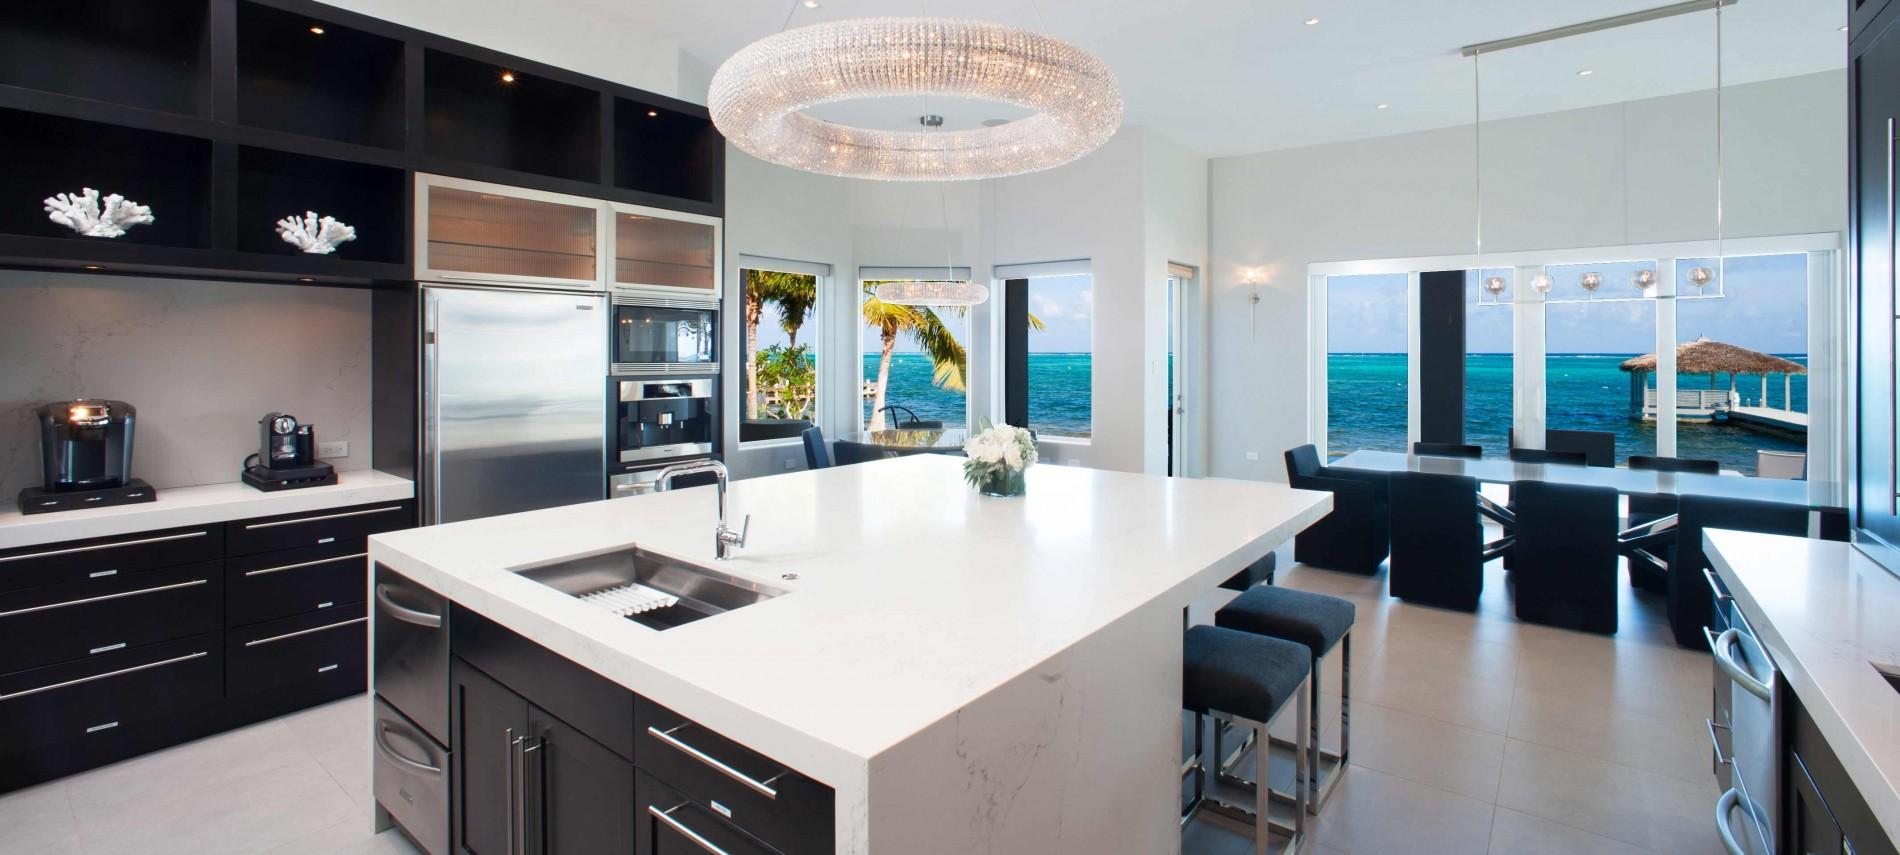 Point of View Cayman Islands | Luxury Villa Cayman Islands